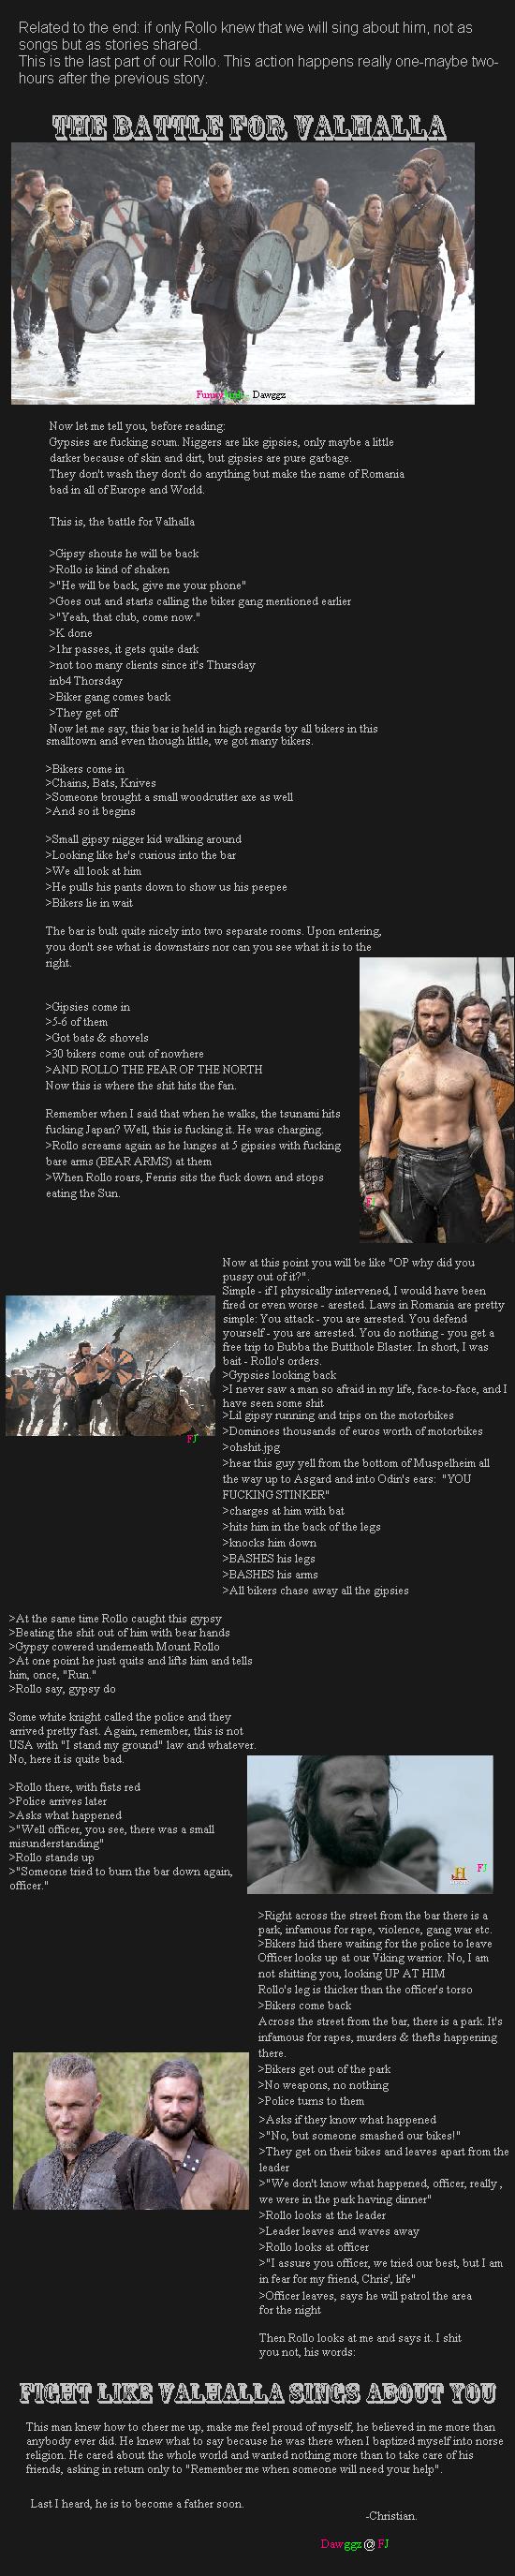 Rollo 4: The Battle for Valhalla. Worth. Part 1: /Bar+adventures+please+read+descripti... Part 2: /Rollo+2+read+description/funny-pictu... Part 3: /Rollo+3.+The Rollo beast Mode viking warrior VALHALLA odin aint Got shit